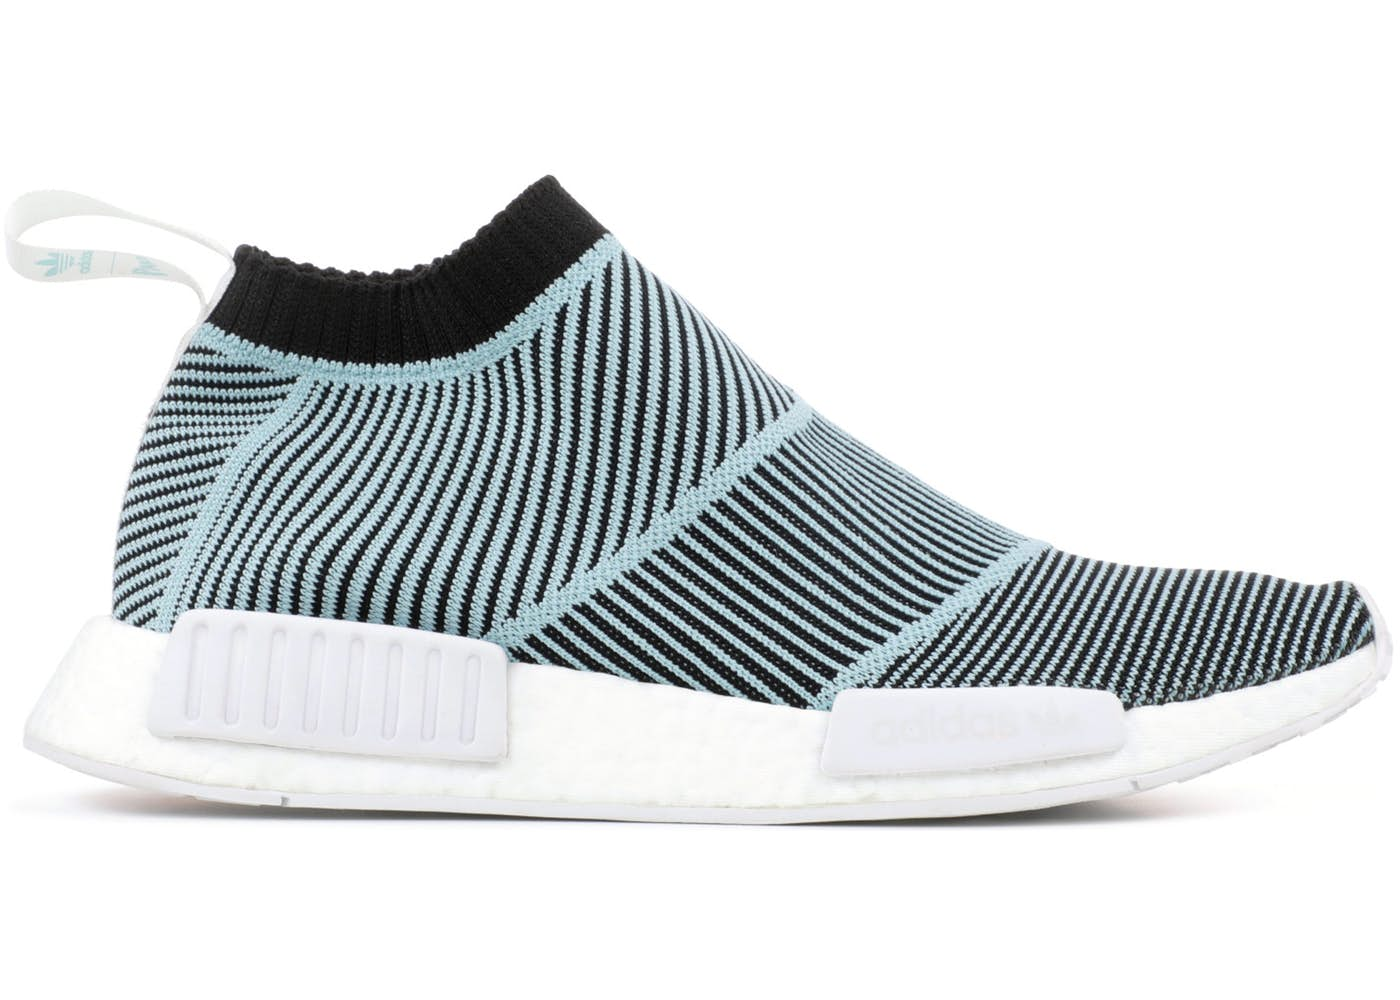 ce880f801 adidas nmd cs1, Adidas Nmd Cs1 City Sock Pk - S79150 – Urban Necessities